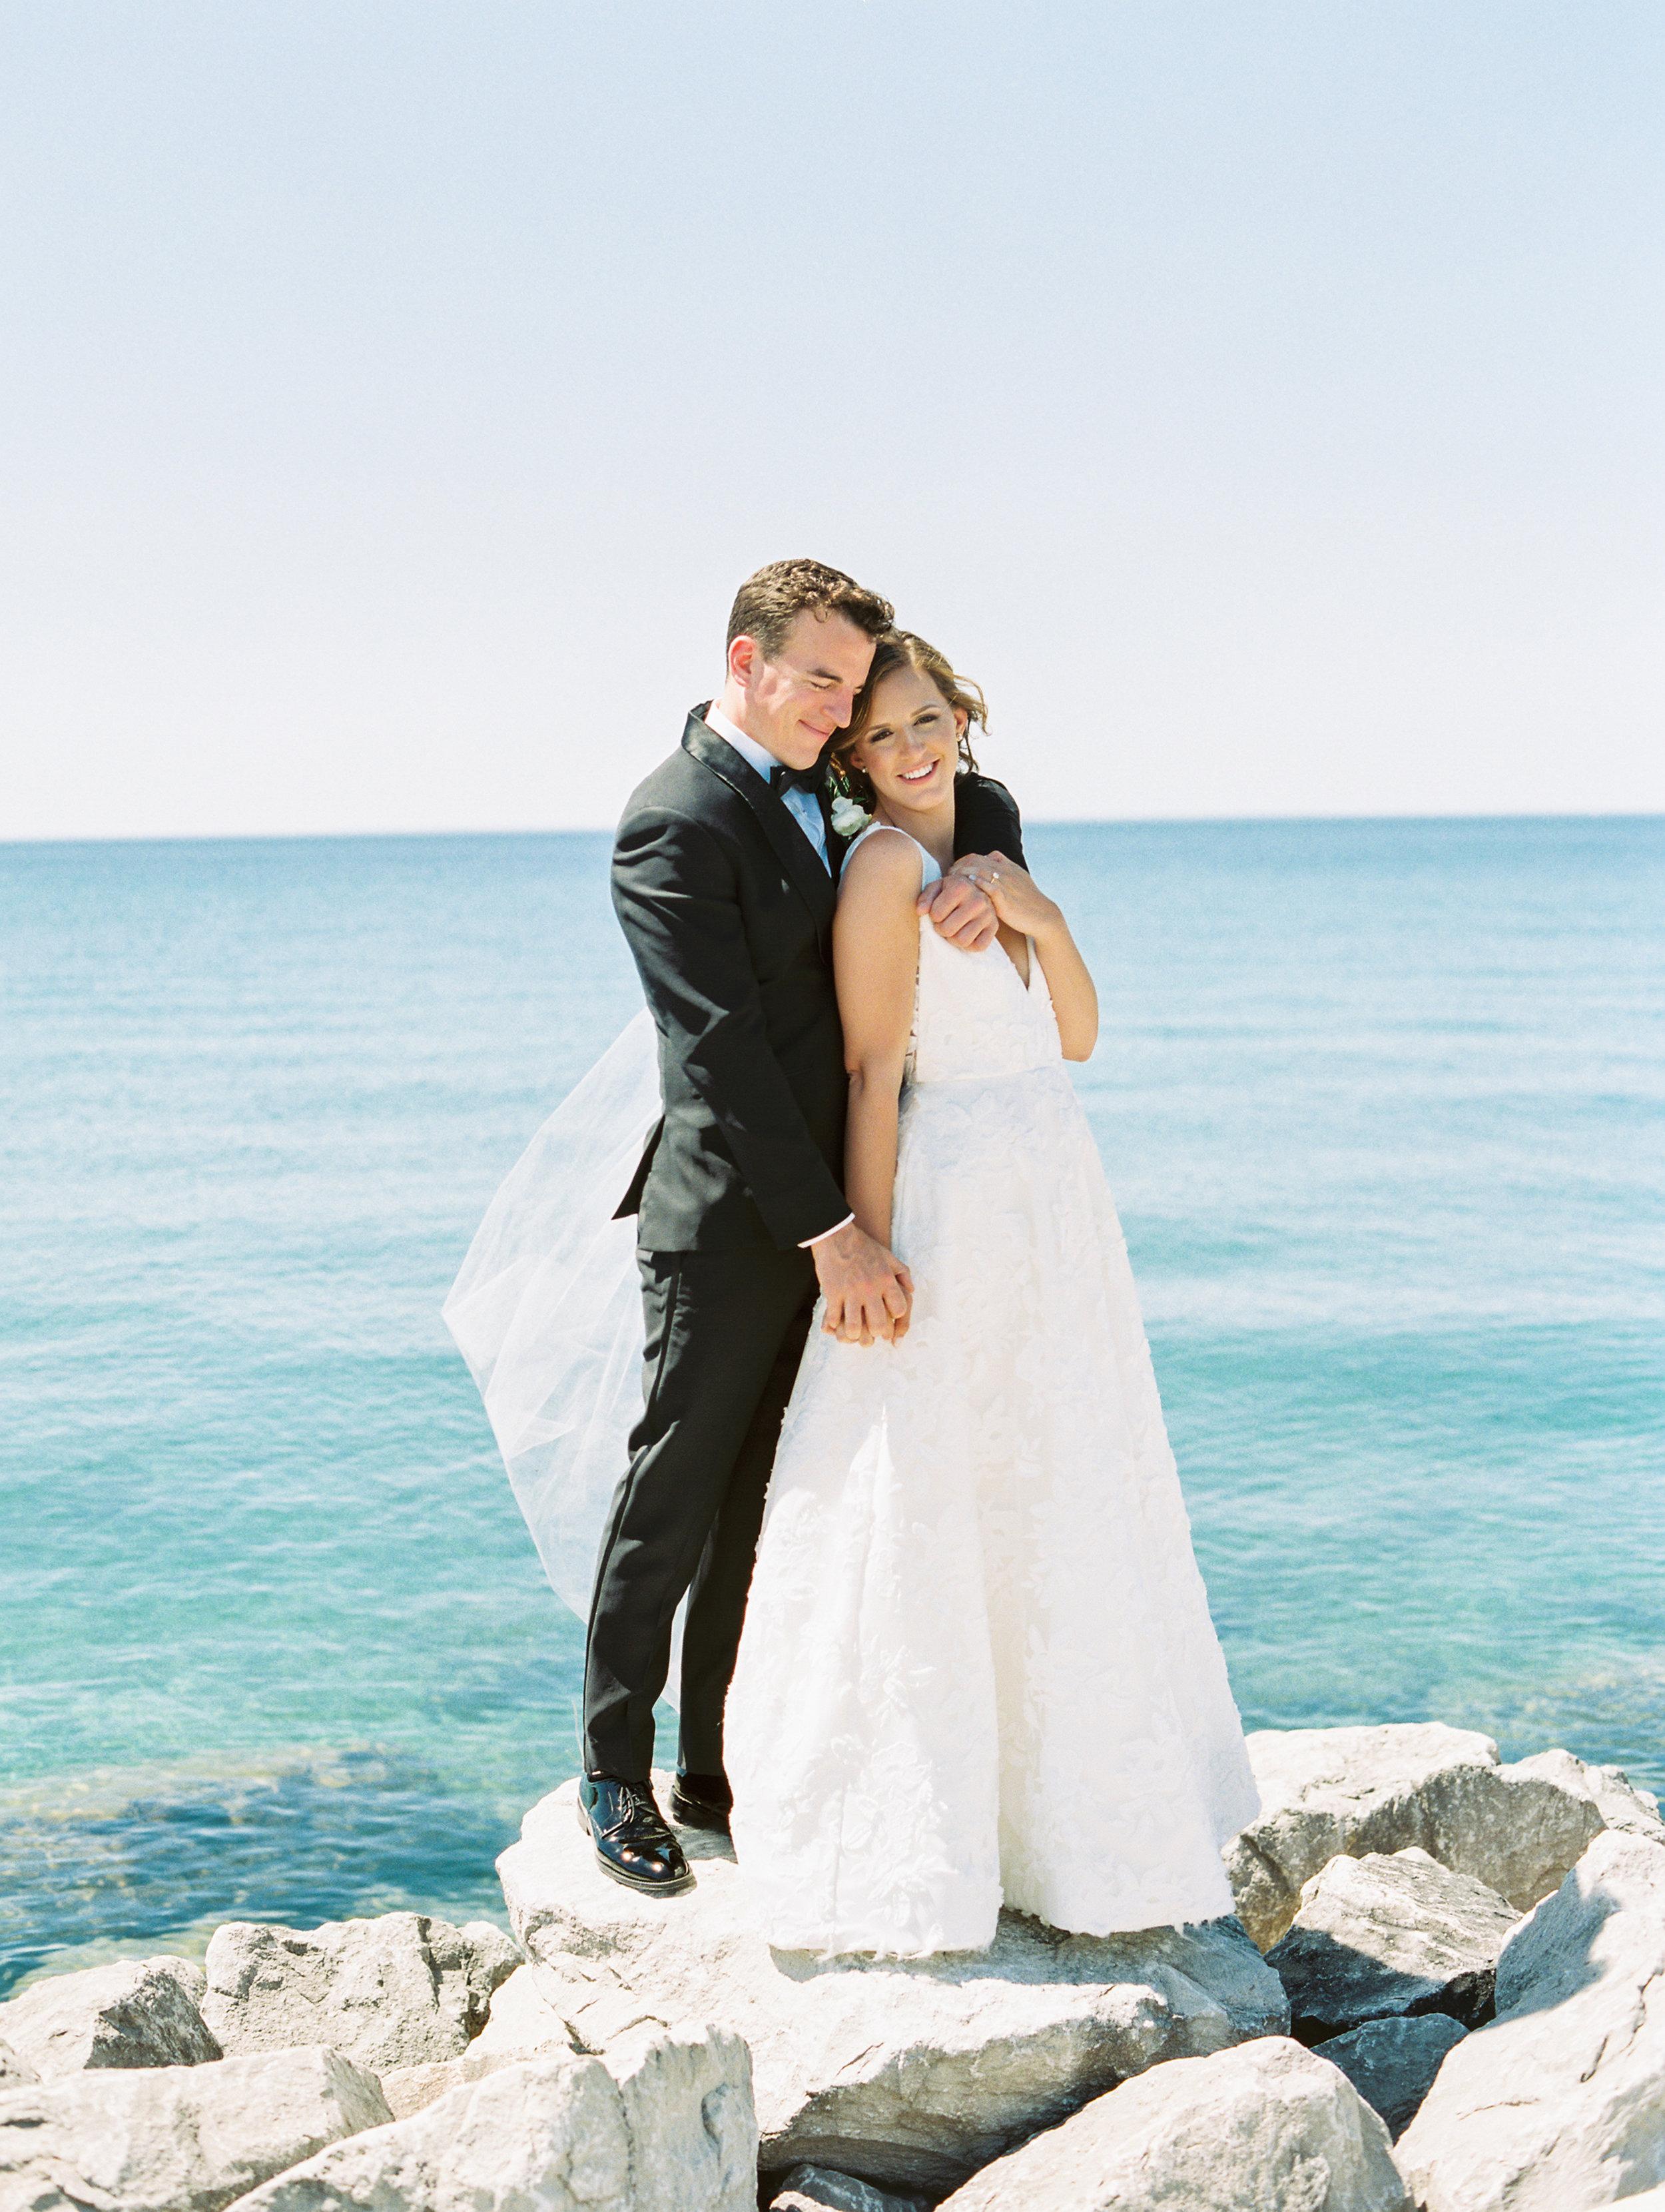 DeGuilio+Wedding+Bridal+Partyf-112.jpg